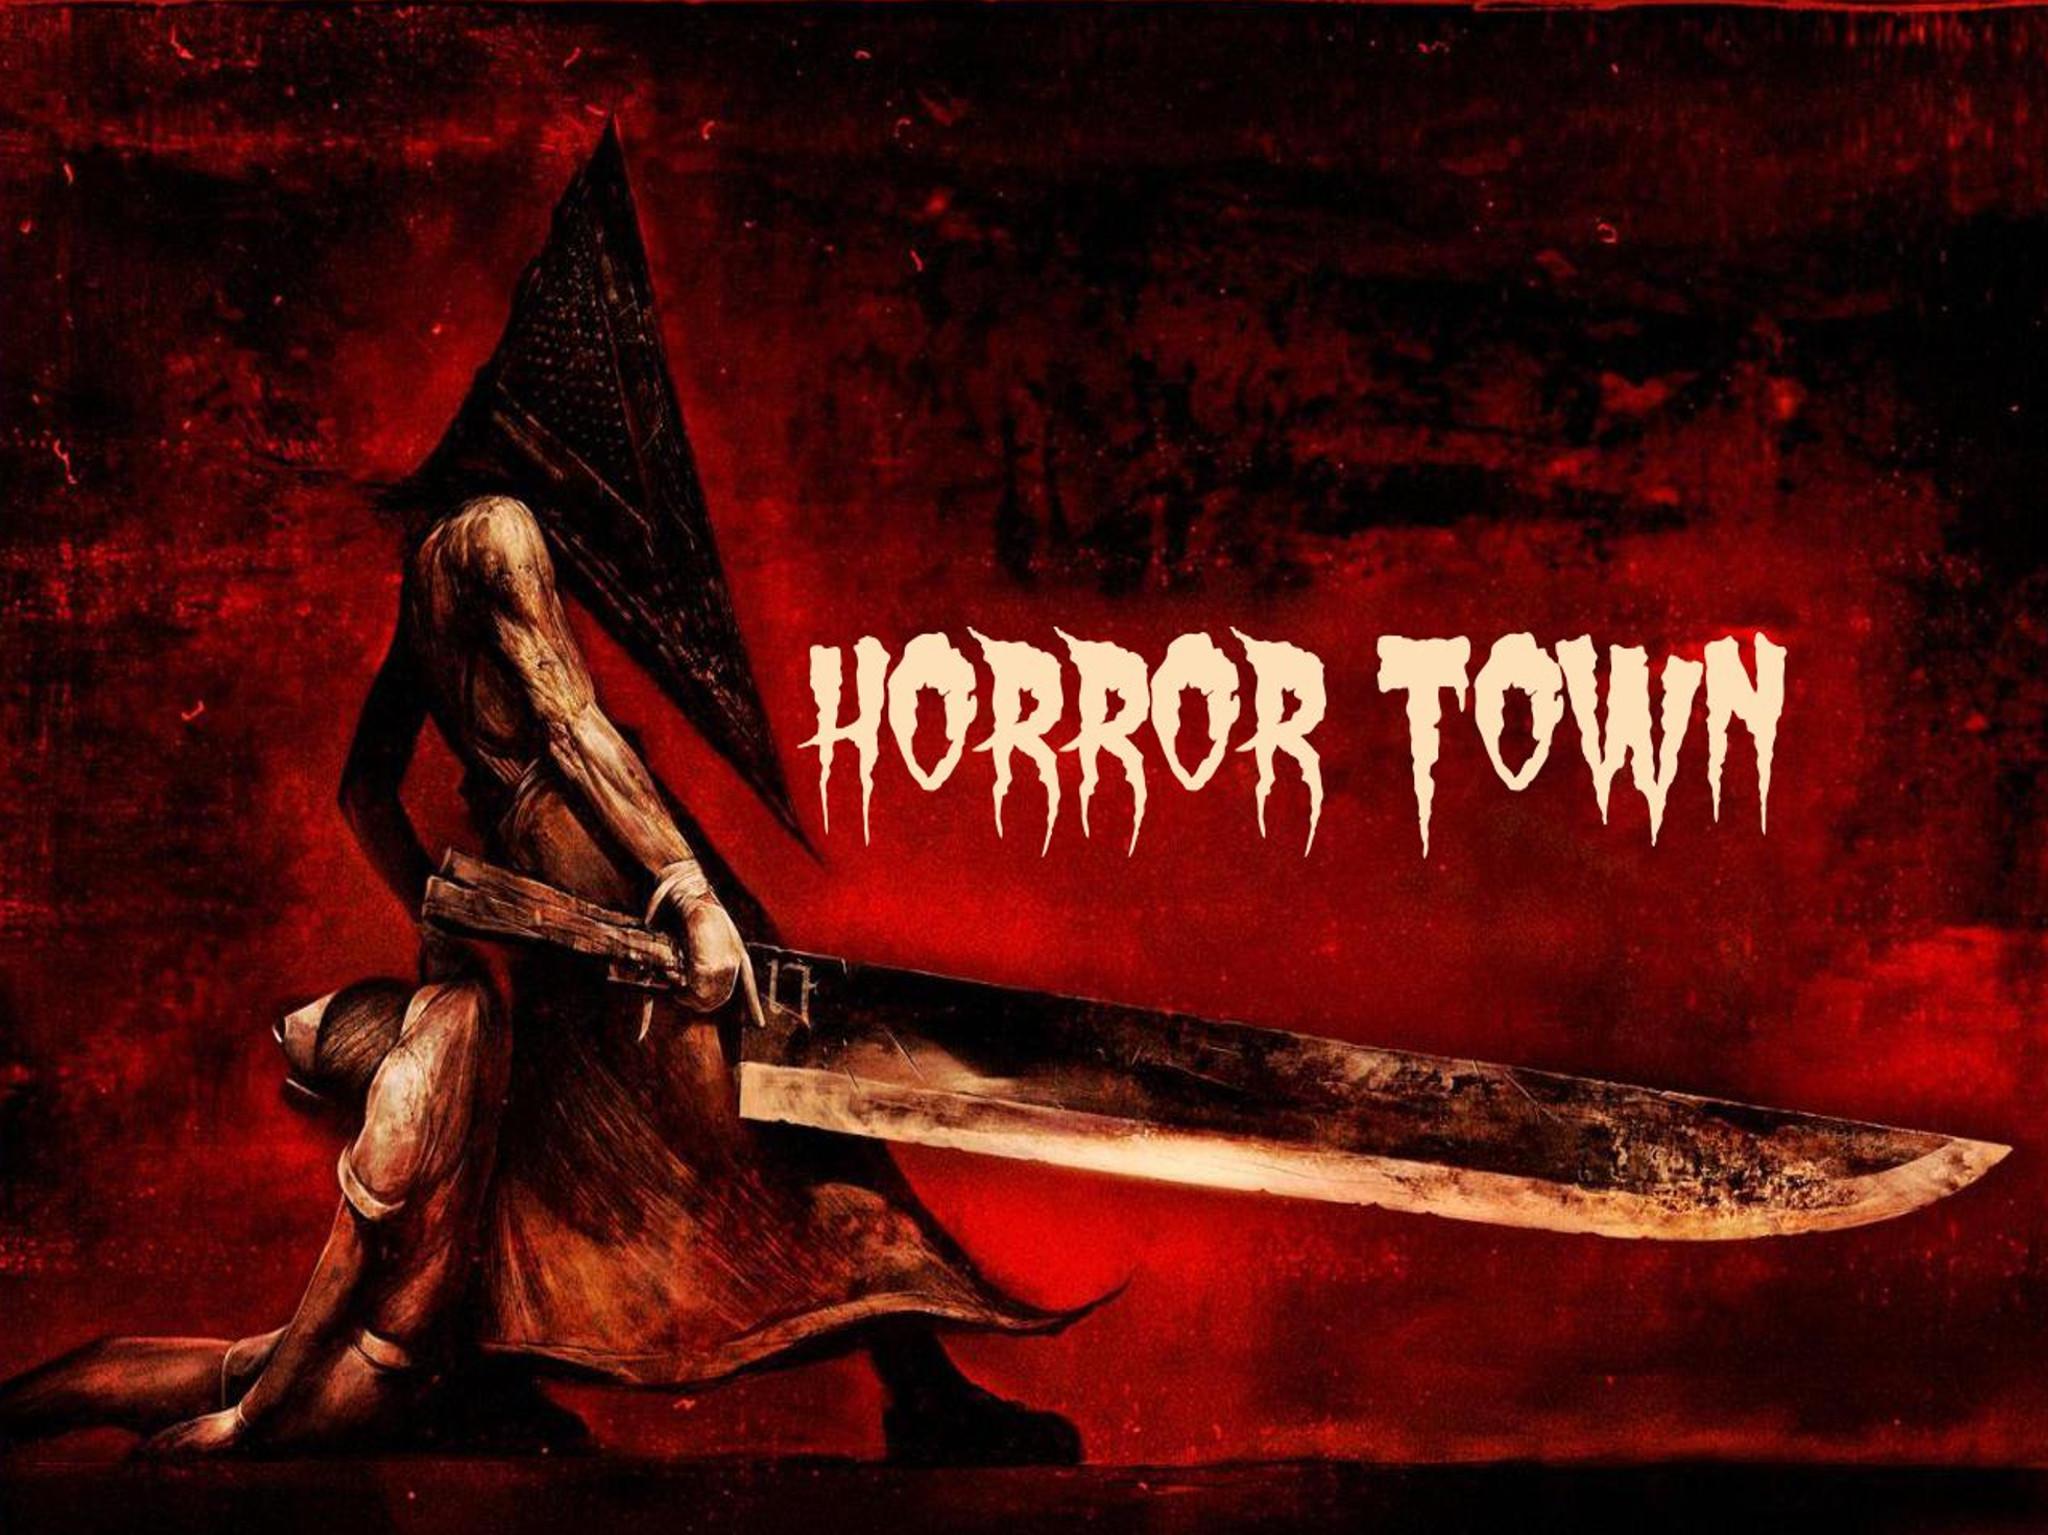 Horror Town